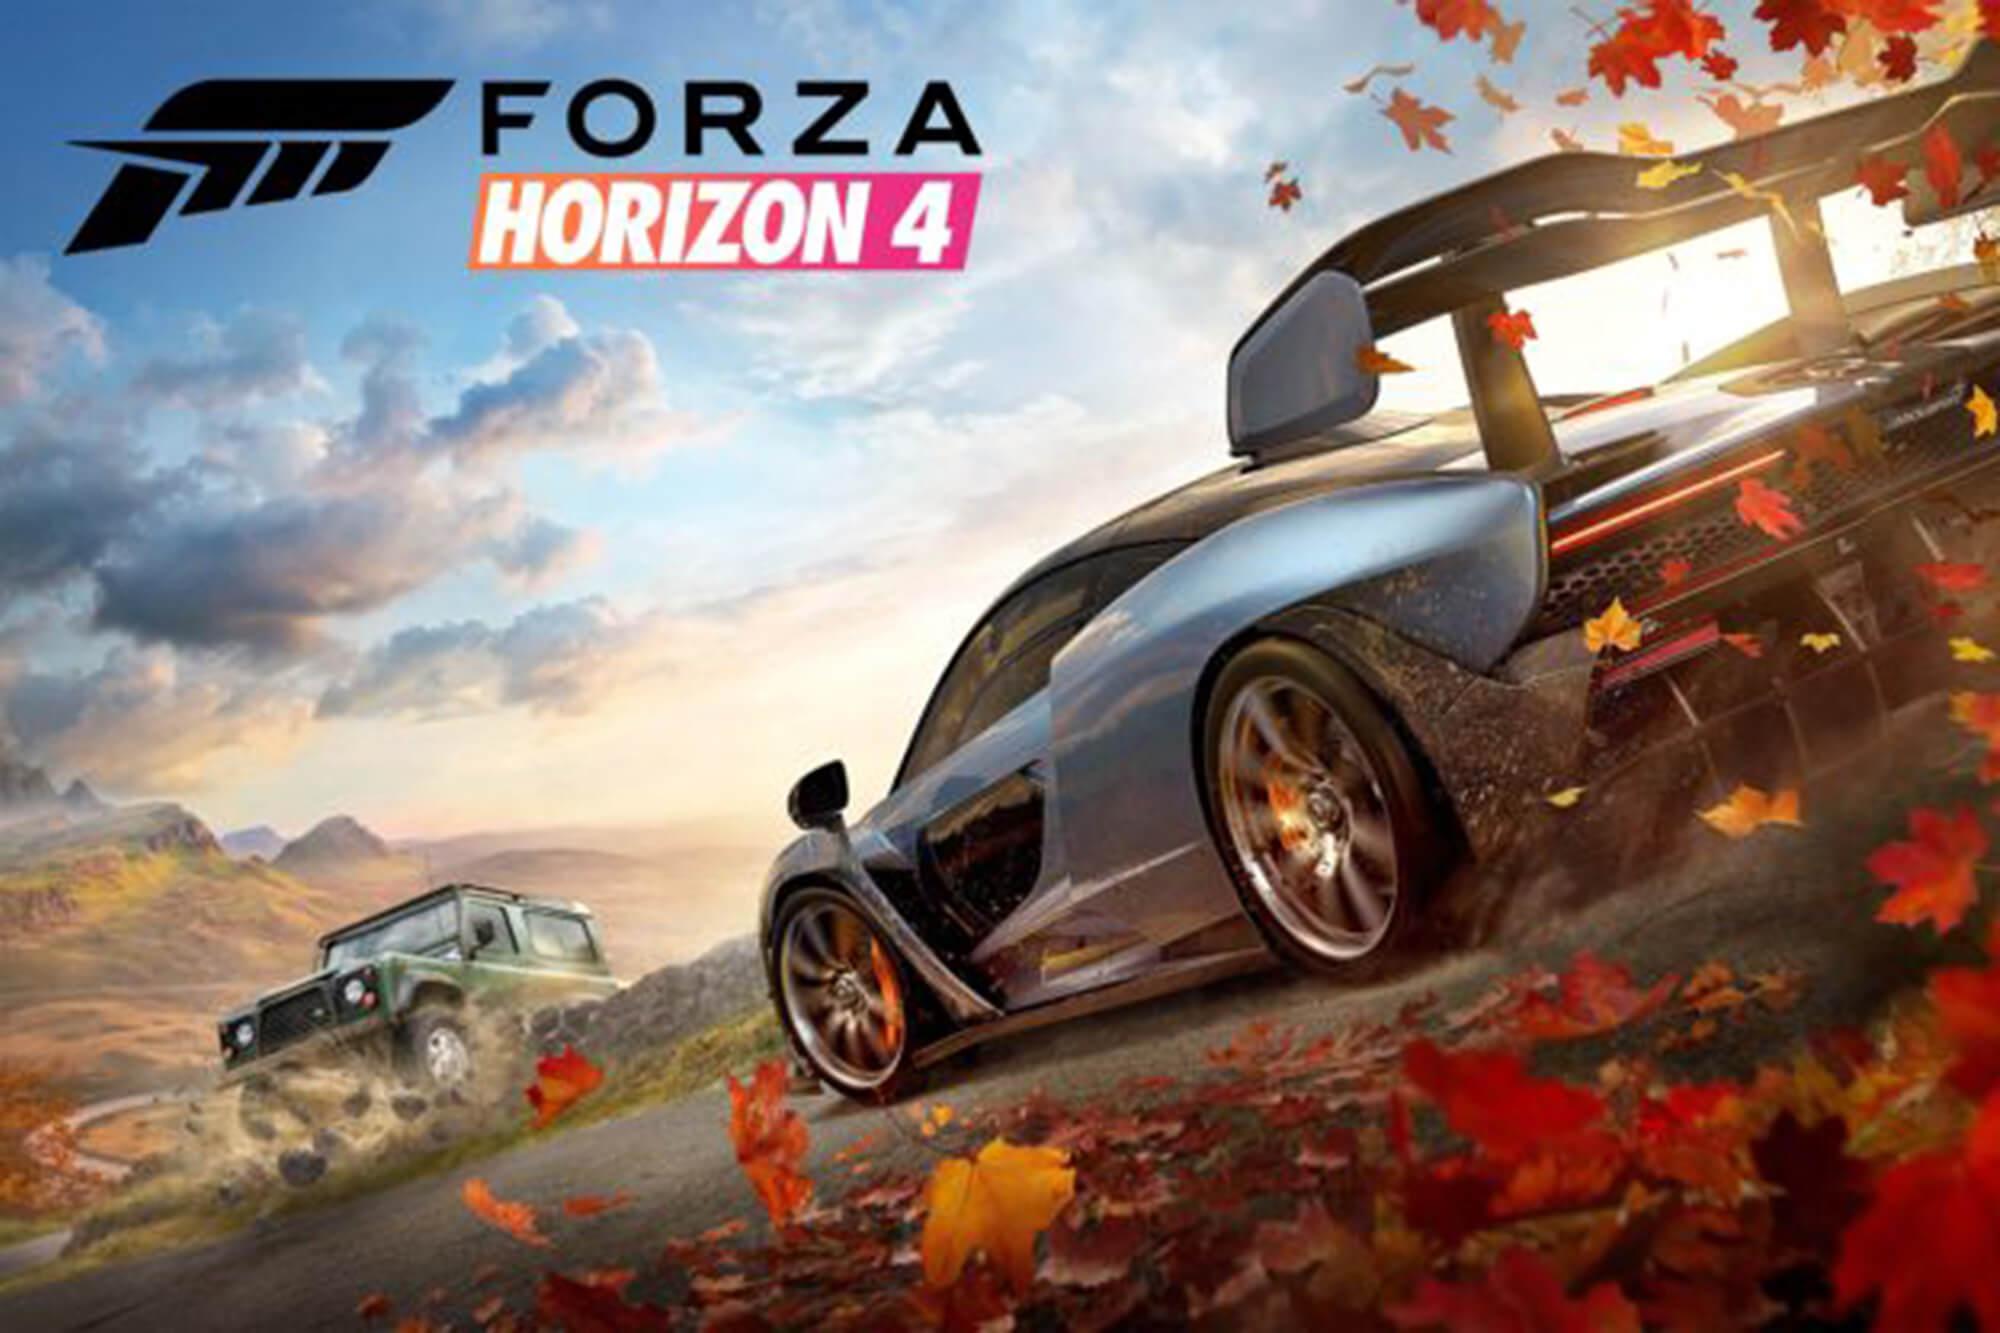 Screenshot of Xbox game Forza Horizon 4